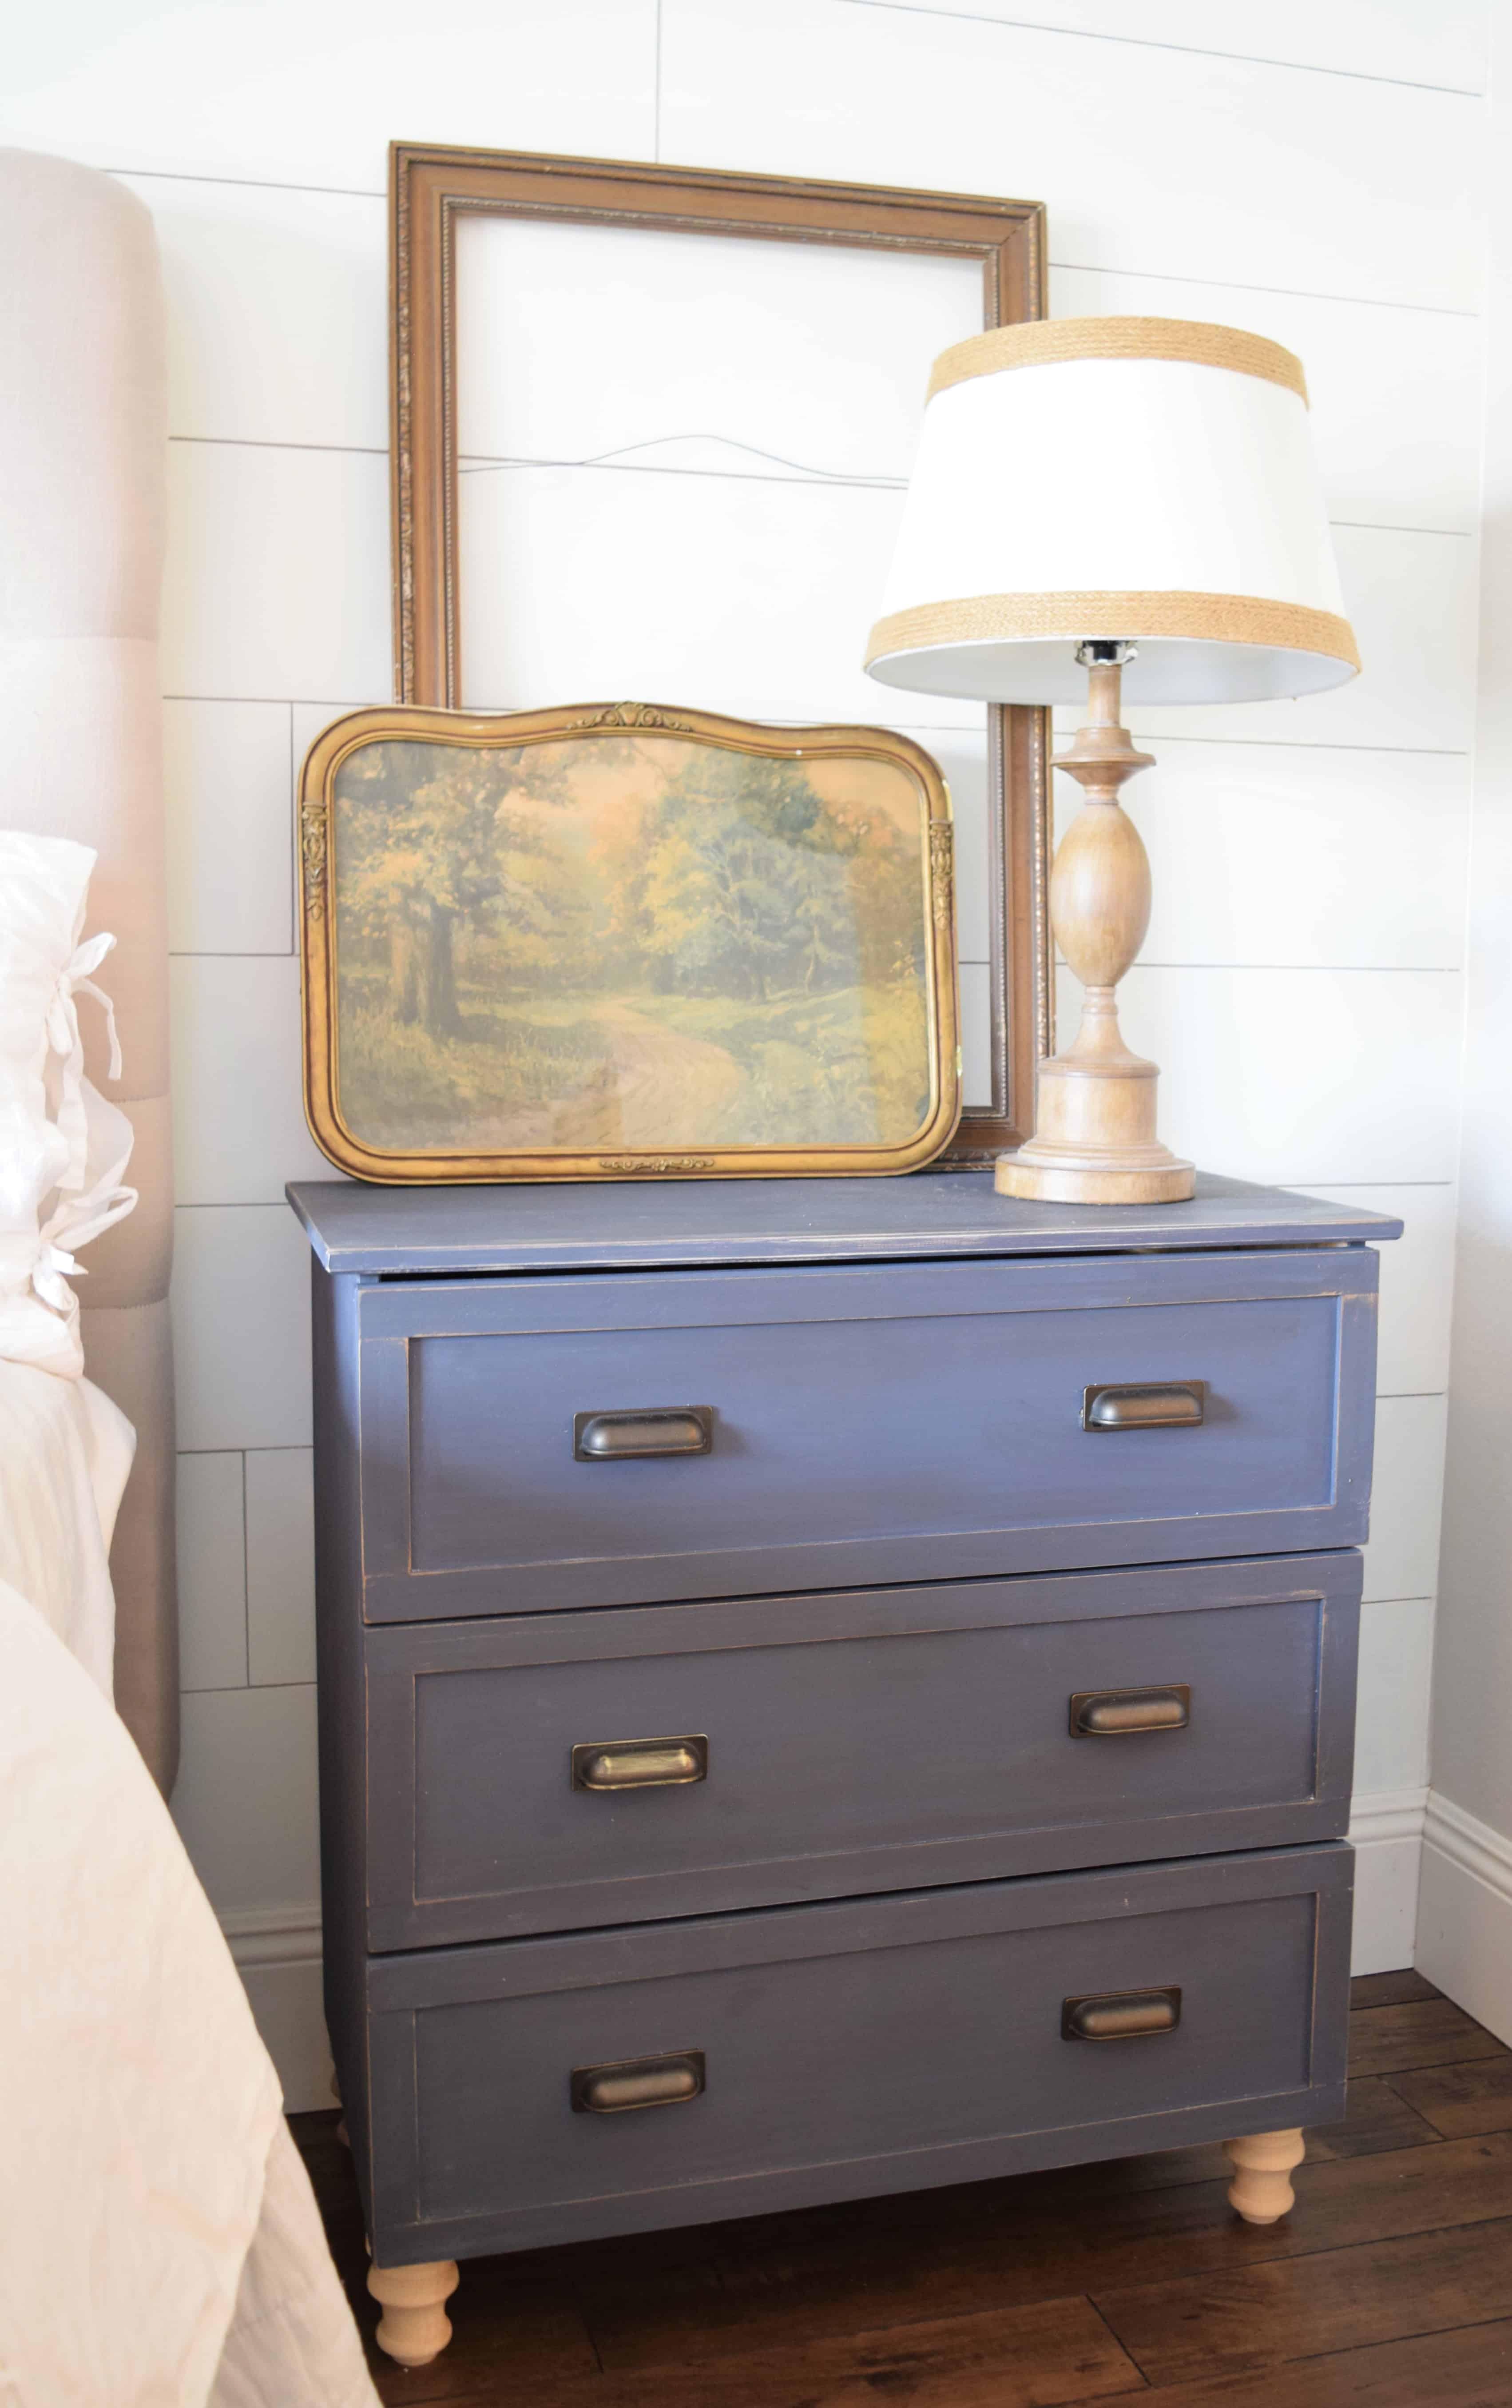 ikea tarva dresser hack the collected house. Black Bedroom Furniture Sets. Home Design Ideas